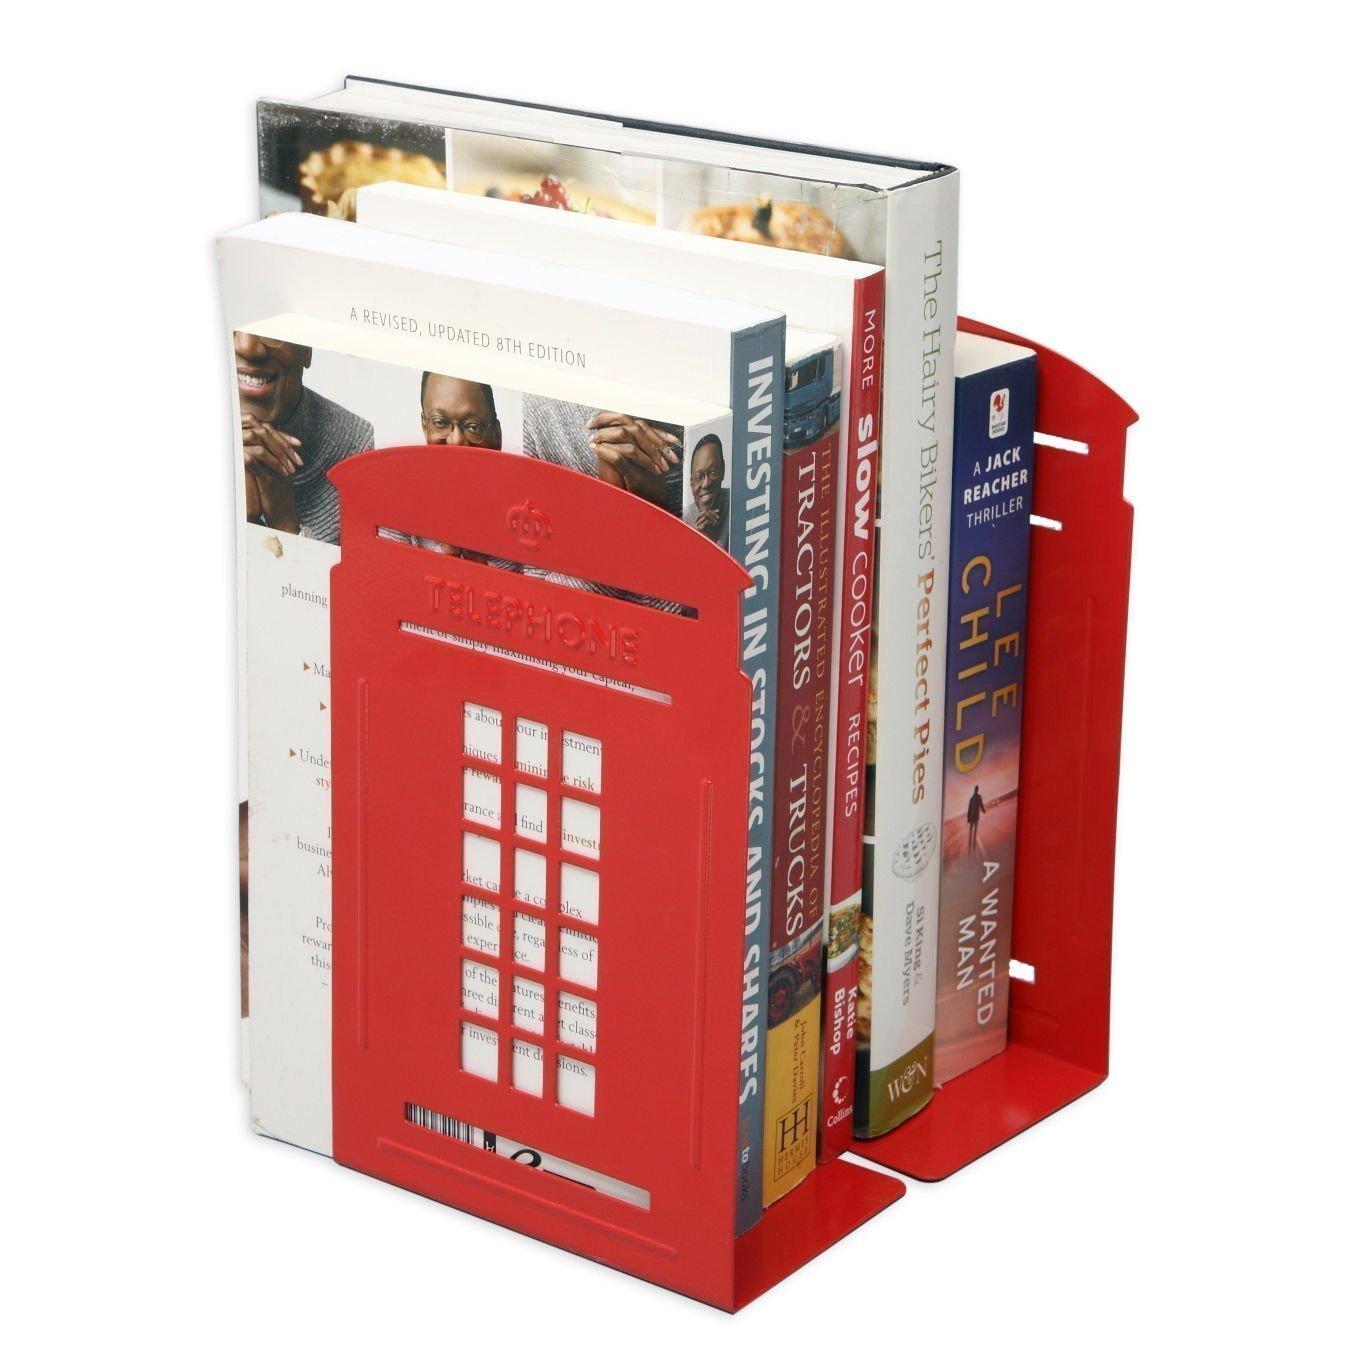 Solid Color Metal Bookends,Decorative Book Ends Desktop Book Organizer Rack For Library School Office Bedroom, Desk Study Gift,Non-Slip,1 Pair Baixt